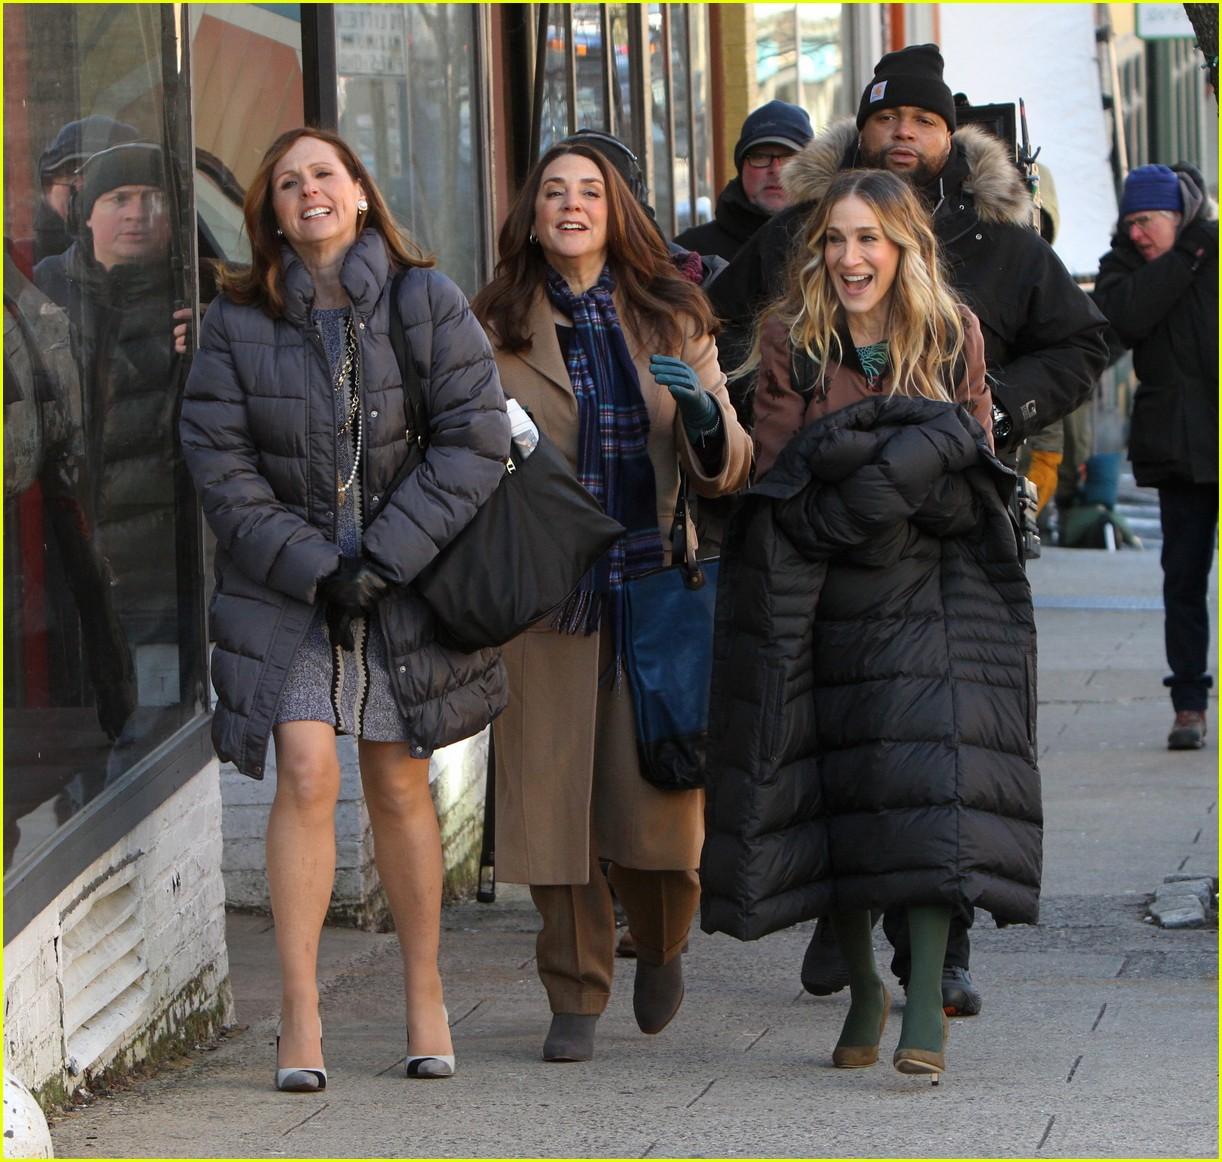 sarah jessica parker and divorce co stars start filming season 3 024212363